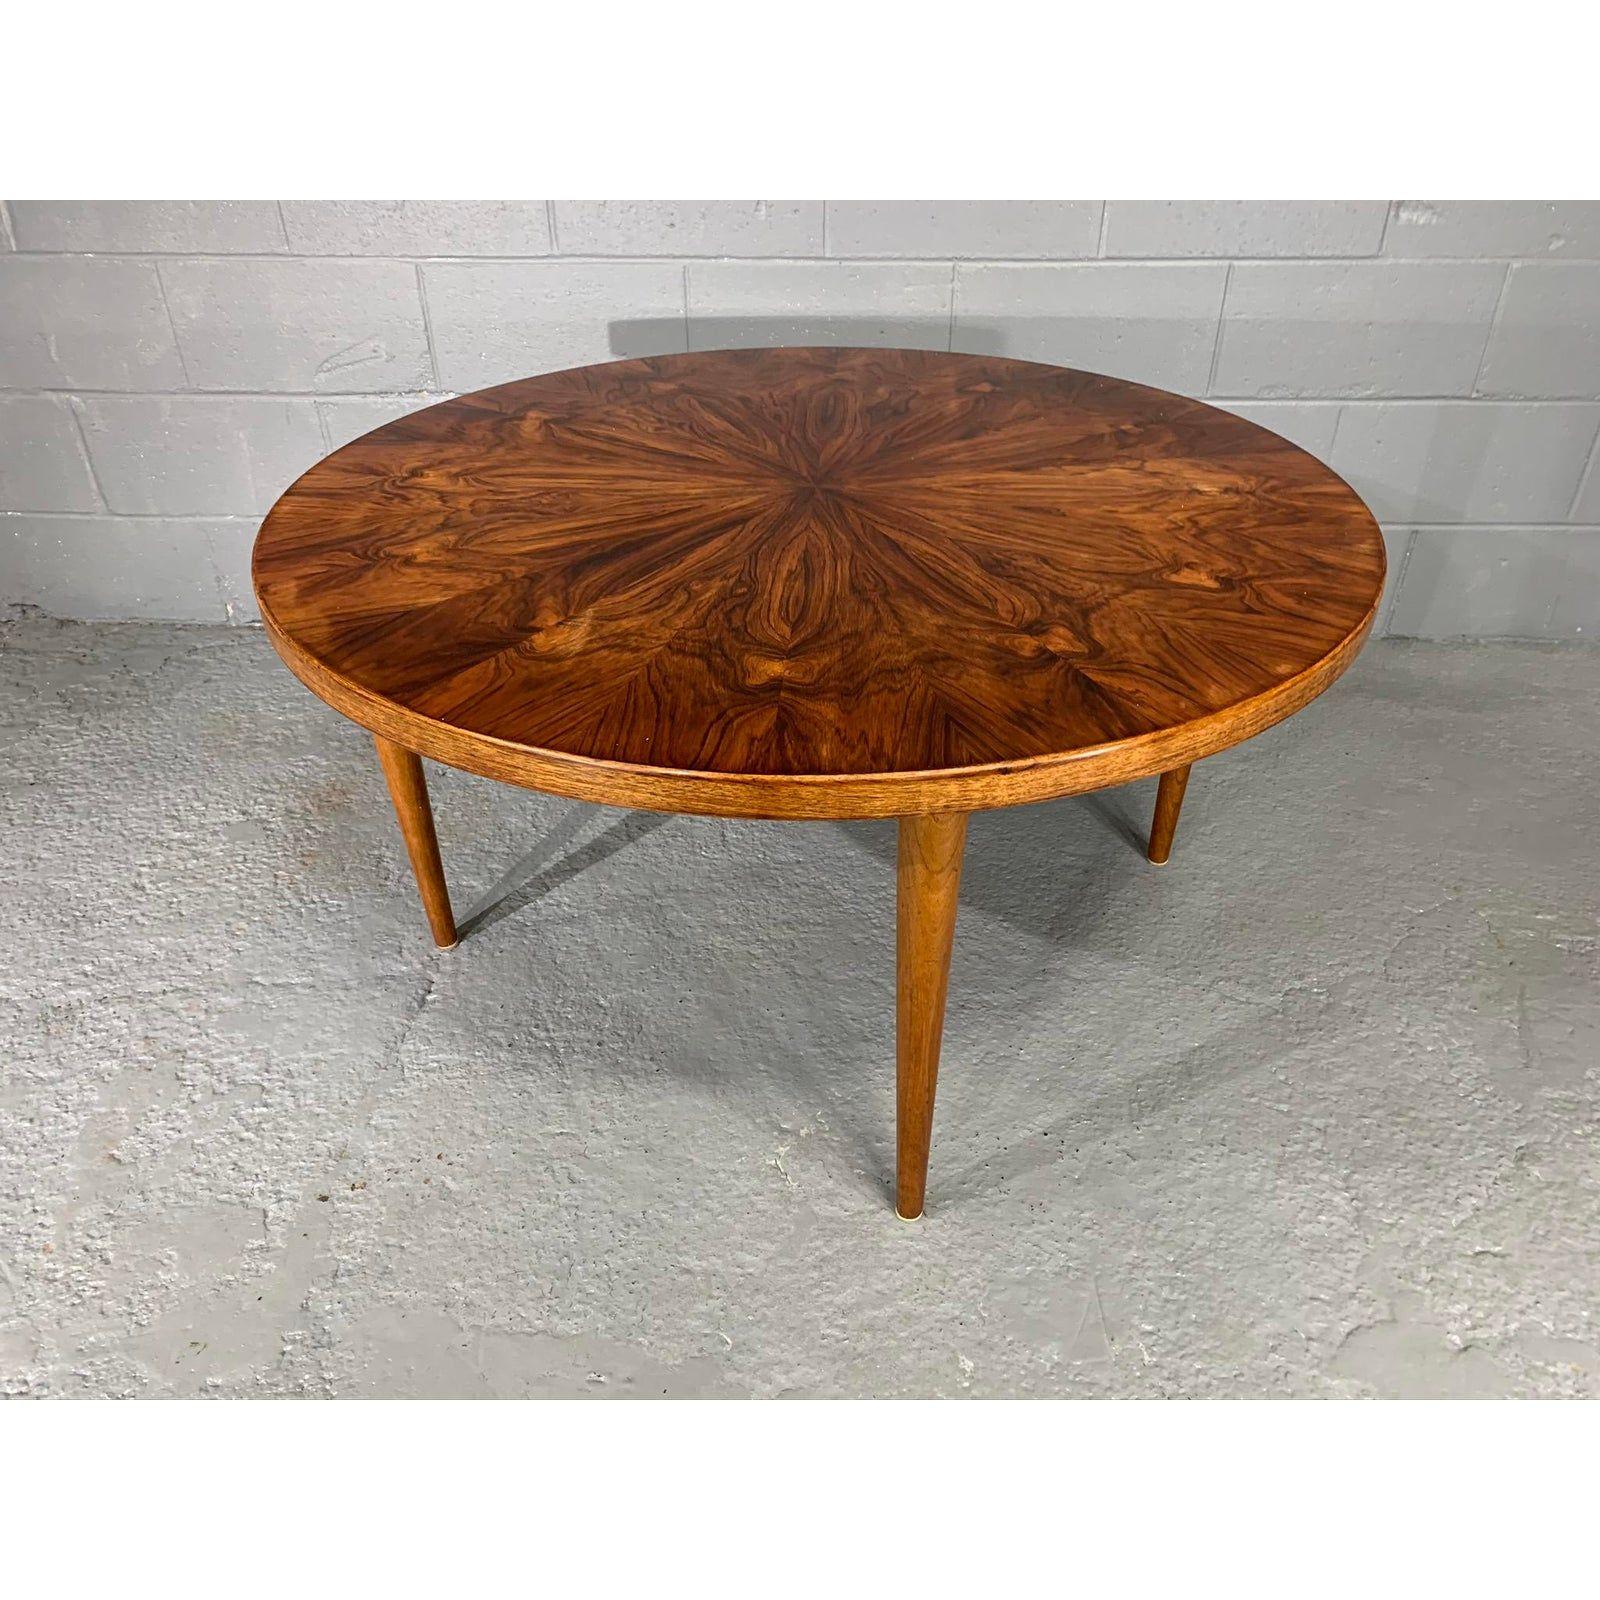 Danish Modern Figured Grain Rosewood Round Coffee Table By Edvard Valentinsen Chairish Coffee Table Danish Modern Table Round Coffee Table [ 1600 x 1600 Pixel ]